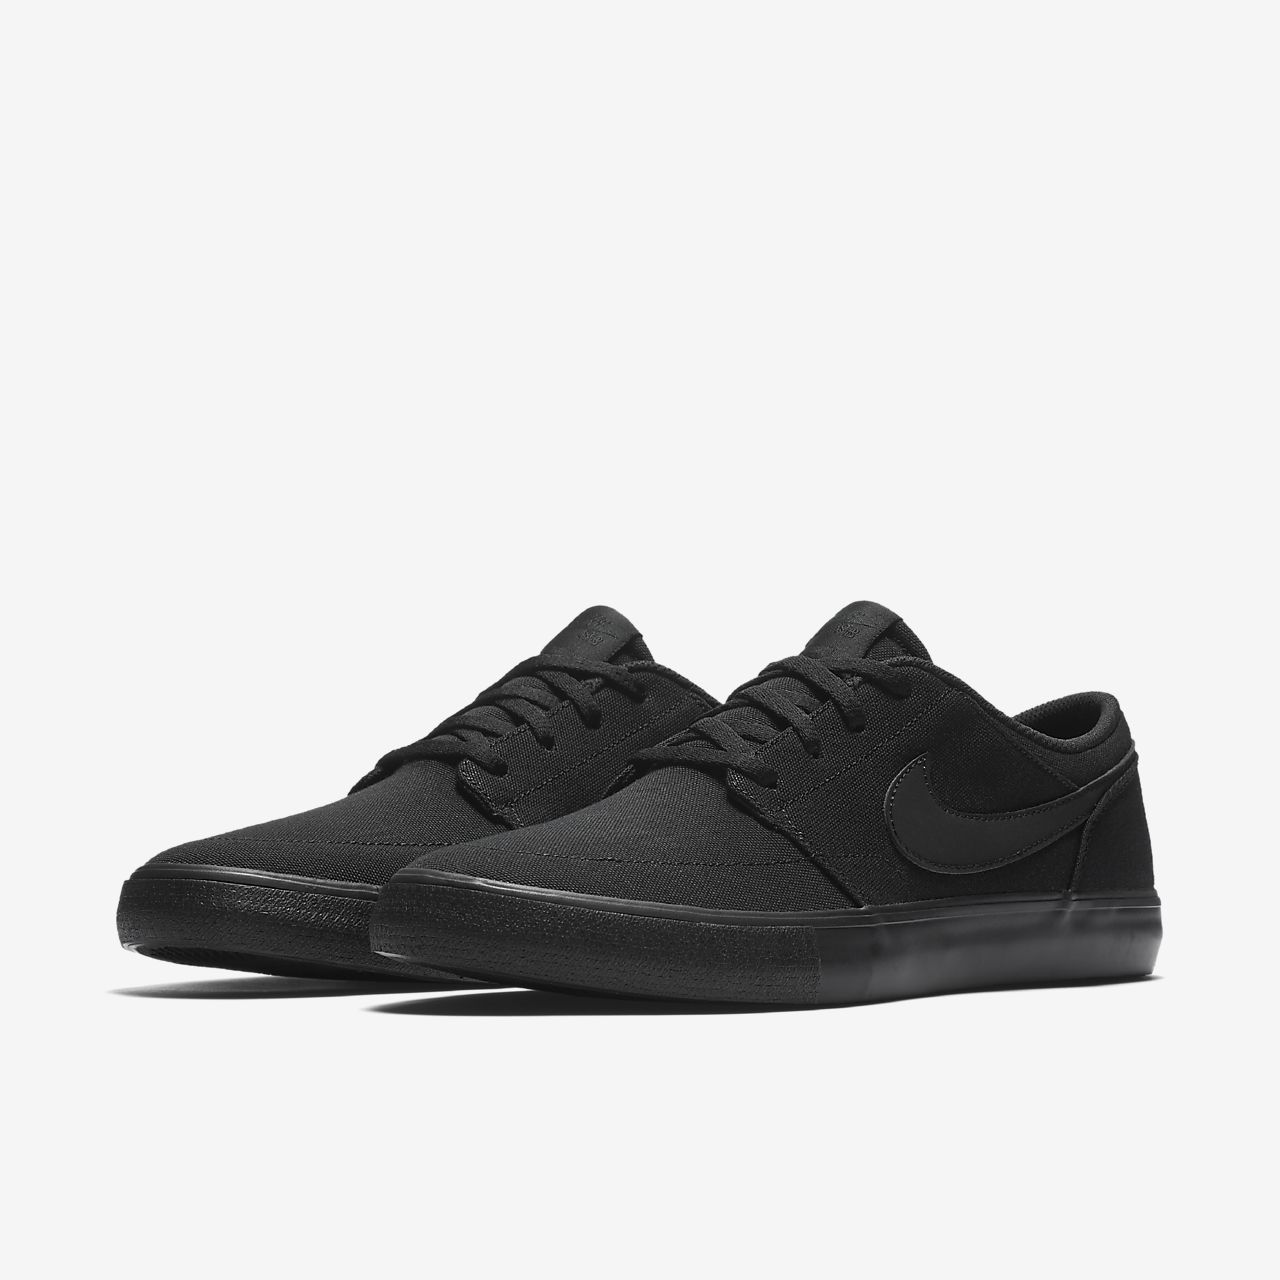 c2693cafb1 Nike SB Solarsoft Portmore 2 Skate Shoe. Nike.com